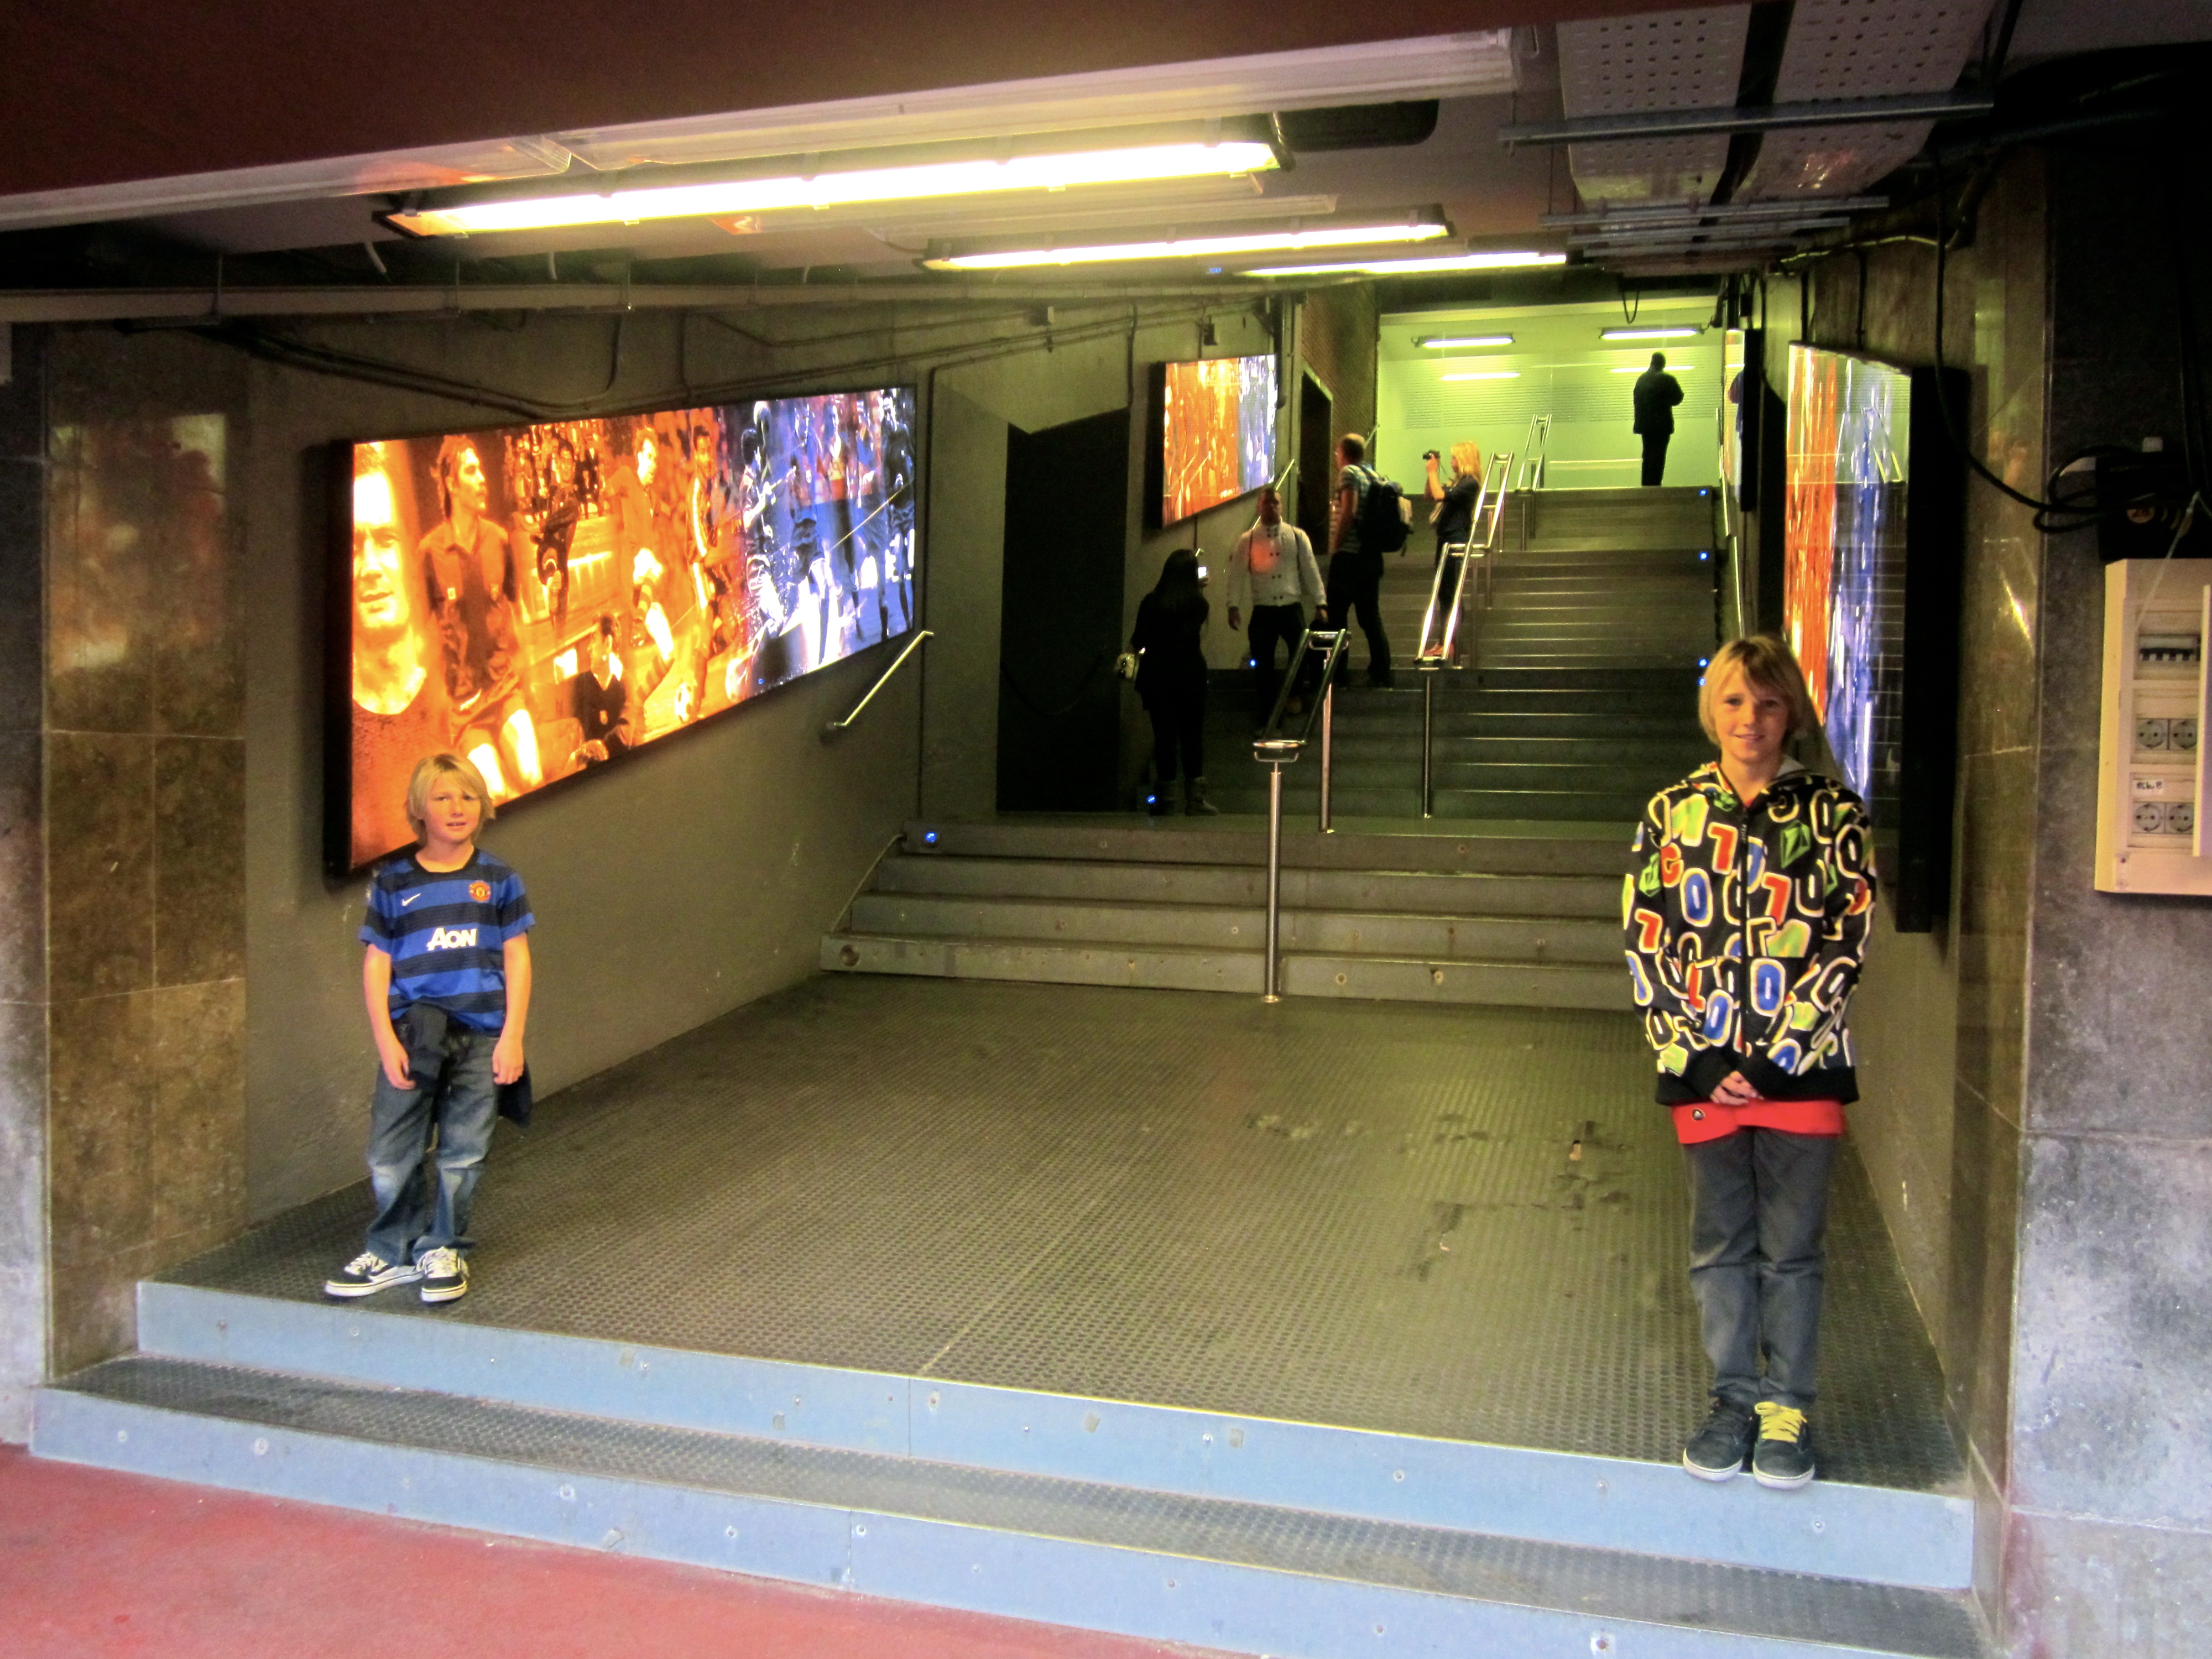 Camp Nou, Barcelona, Spain, soccer, football, Messi